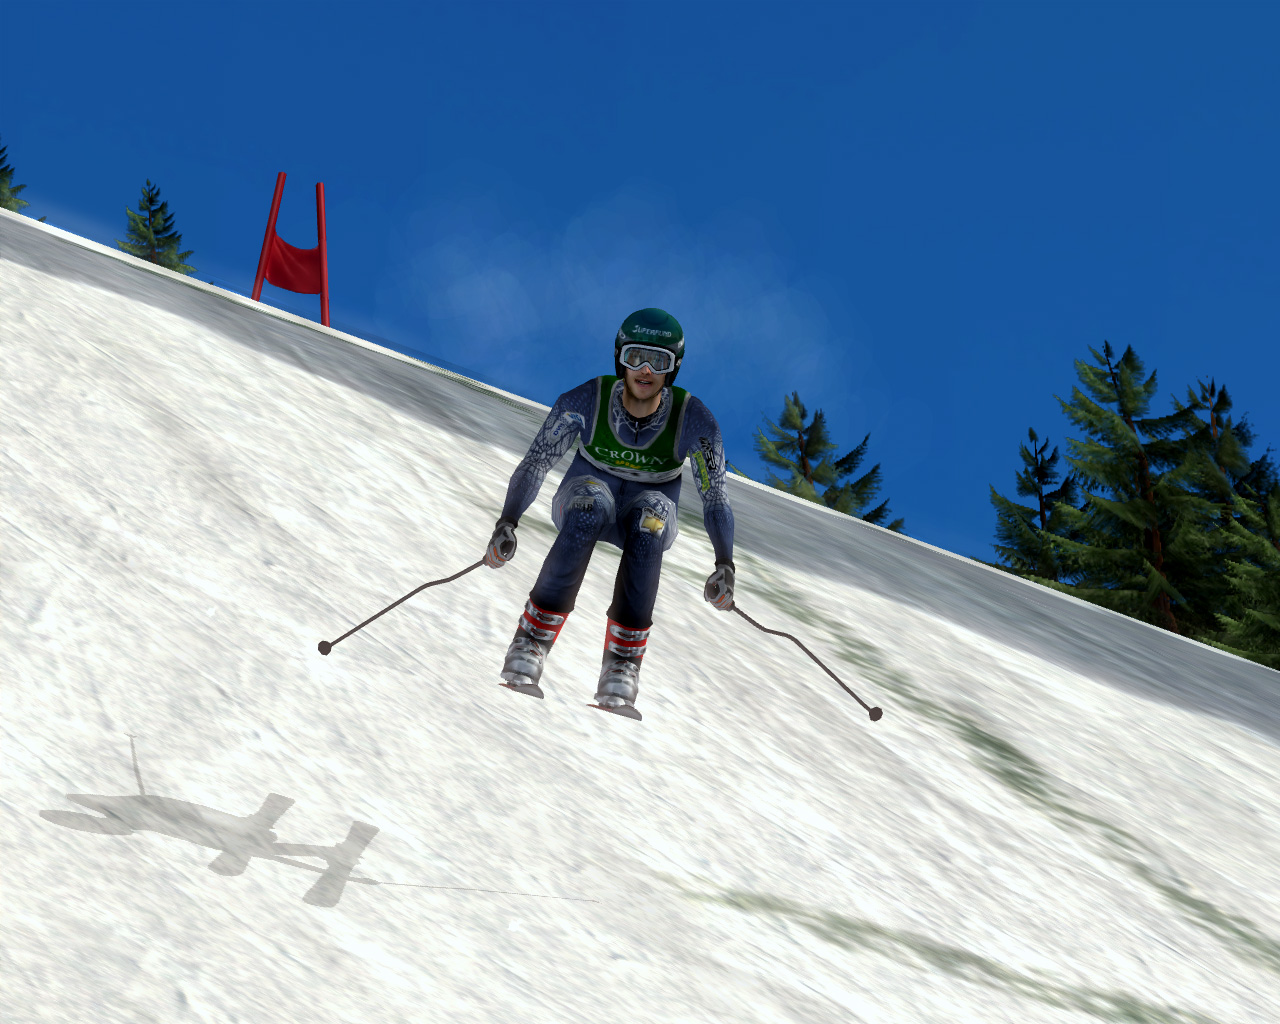 Ski alpin 2006 patch